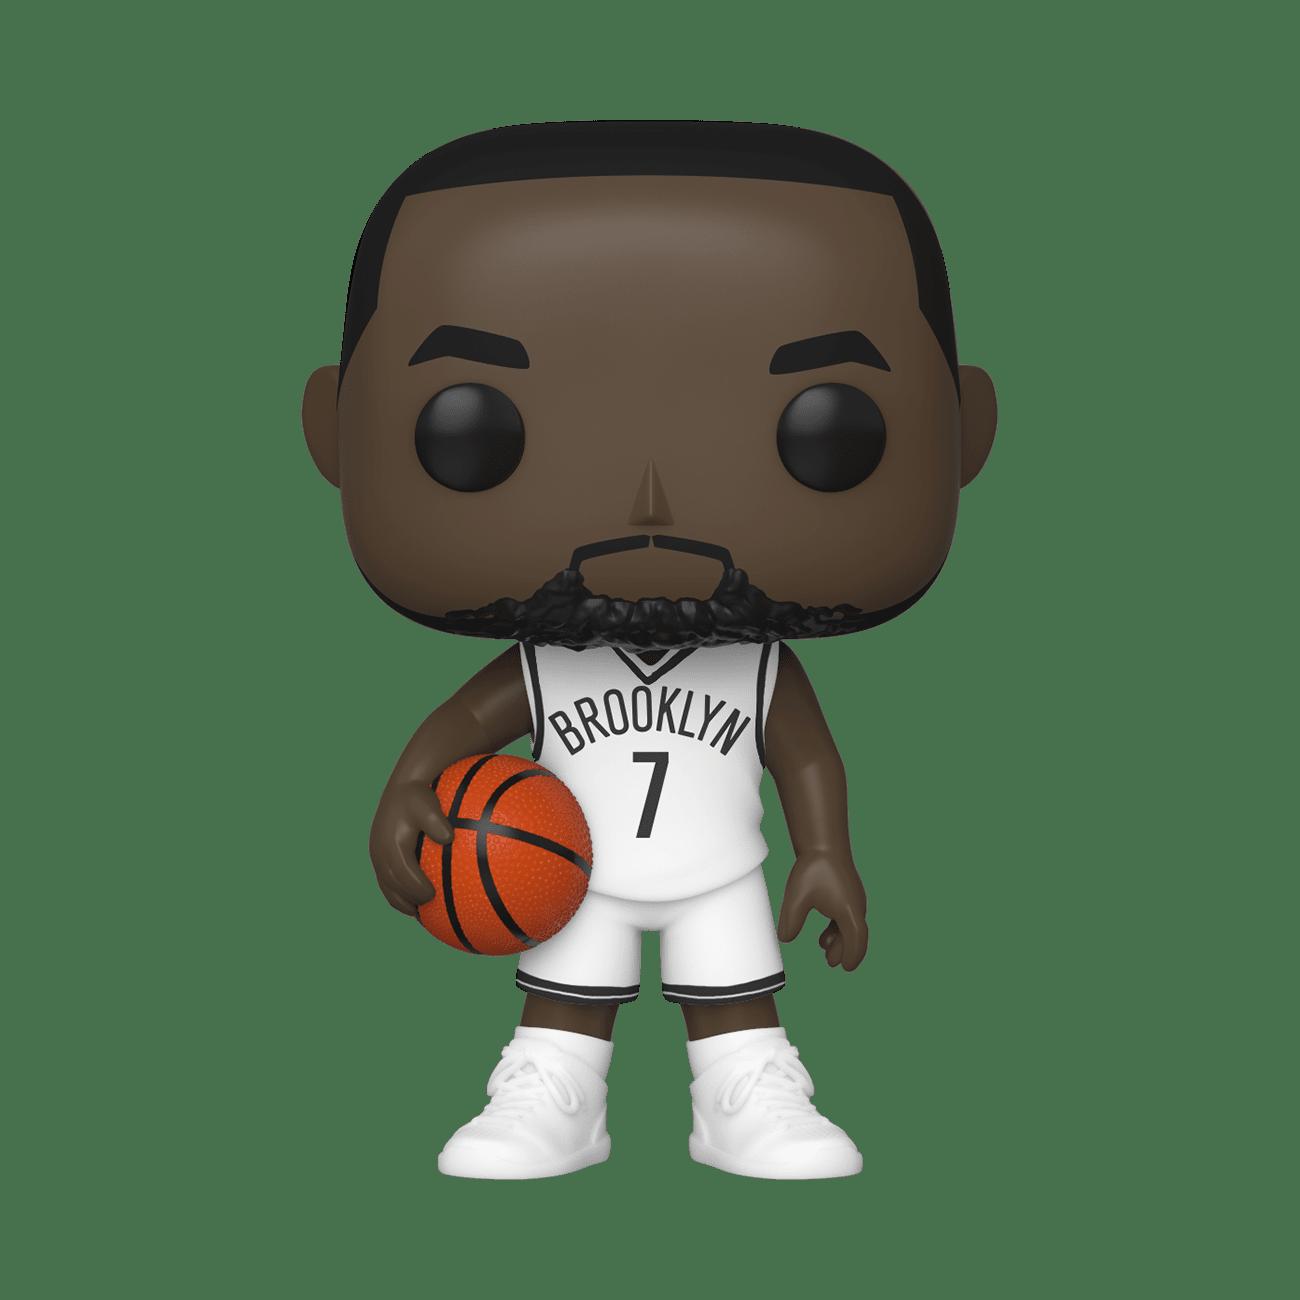 NBA: Nets - Kevin Durant POP! Vinyl Figure